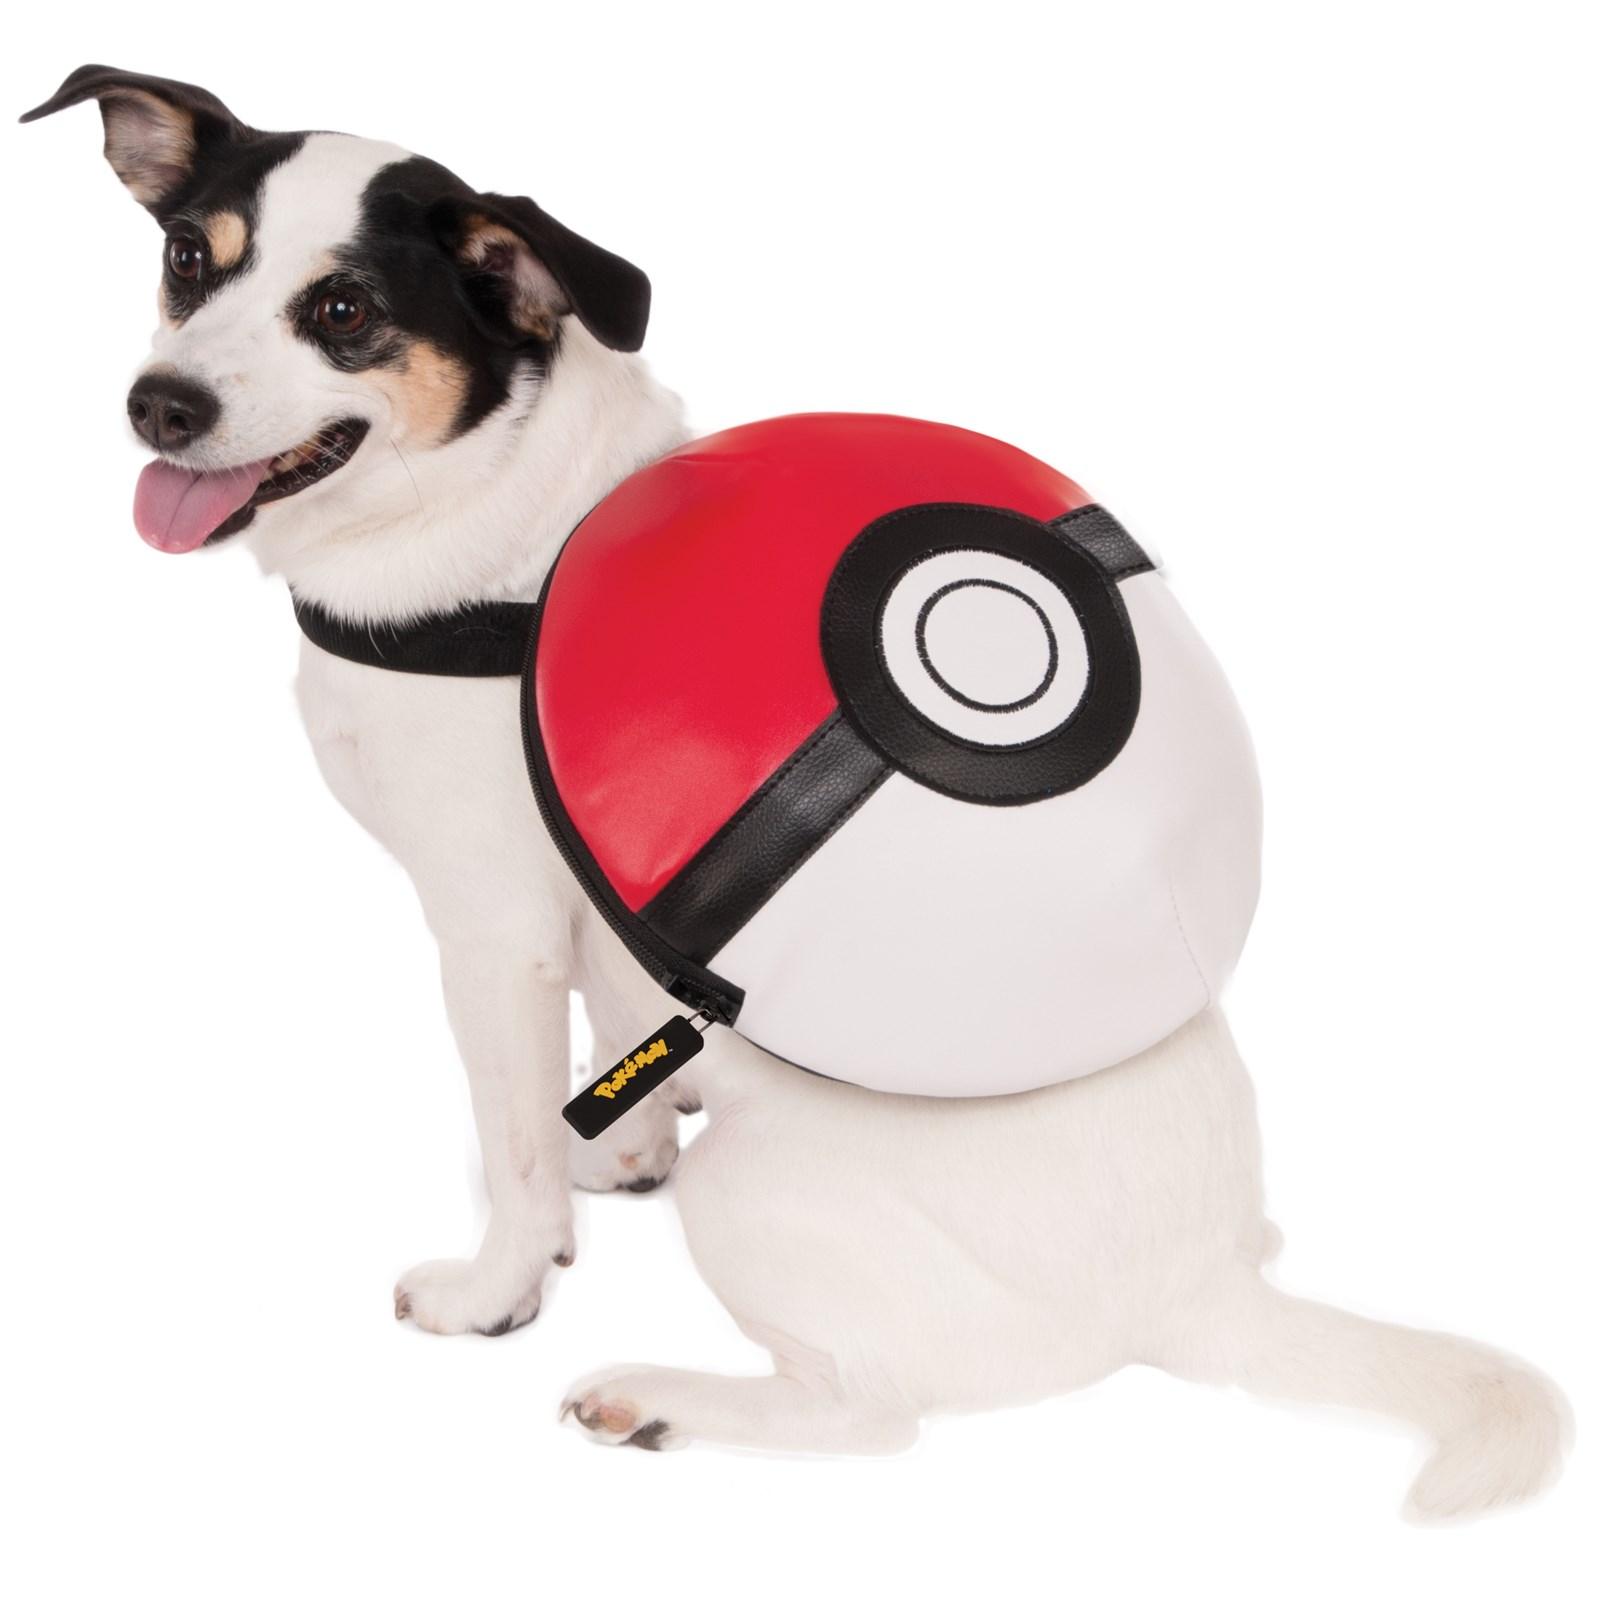 pokemon pokeball backpack pet costume - Costume Props